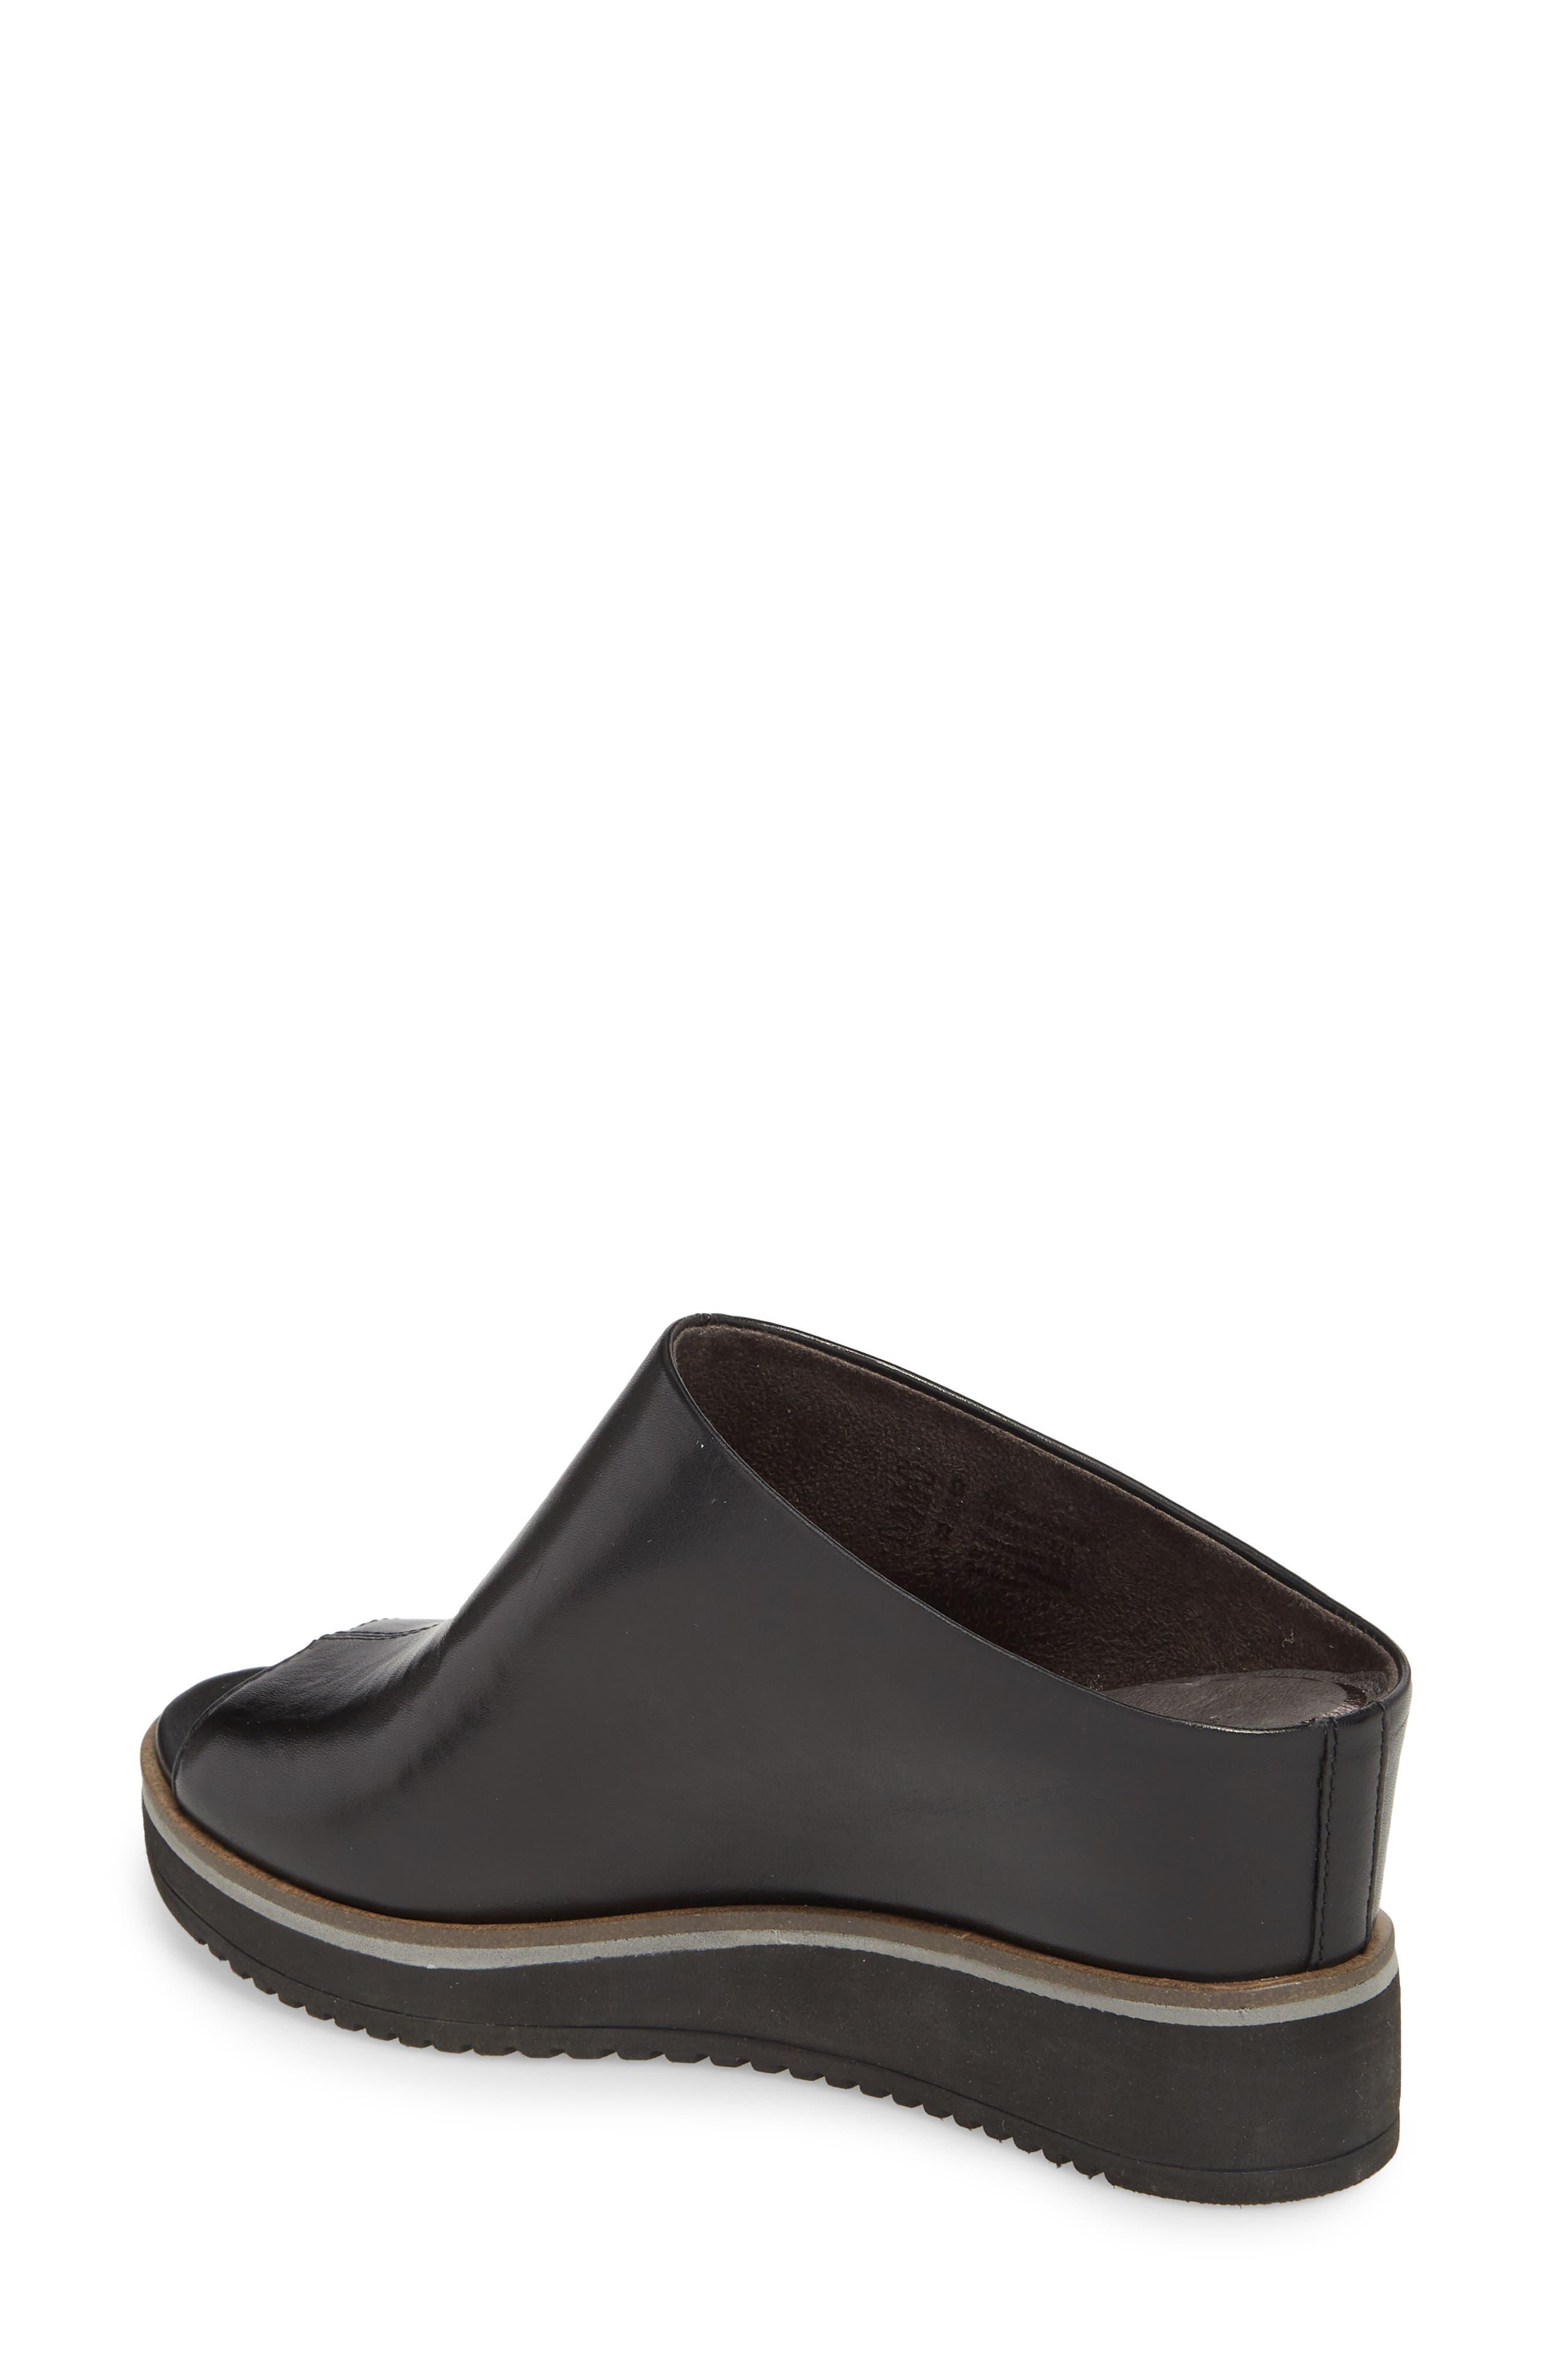 Alis Wedge Sandal,                             Alternate thumbnail 2, color,                             Black/ Black Leather